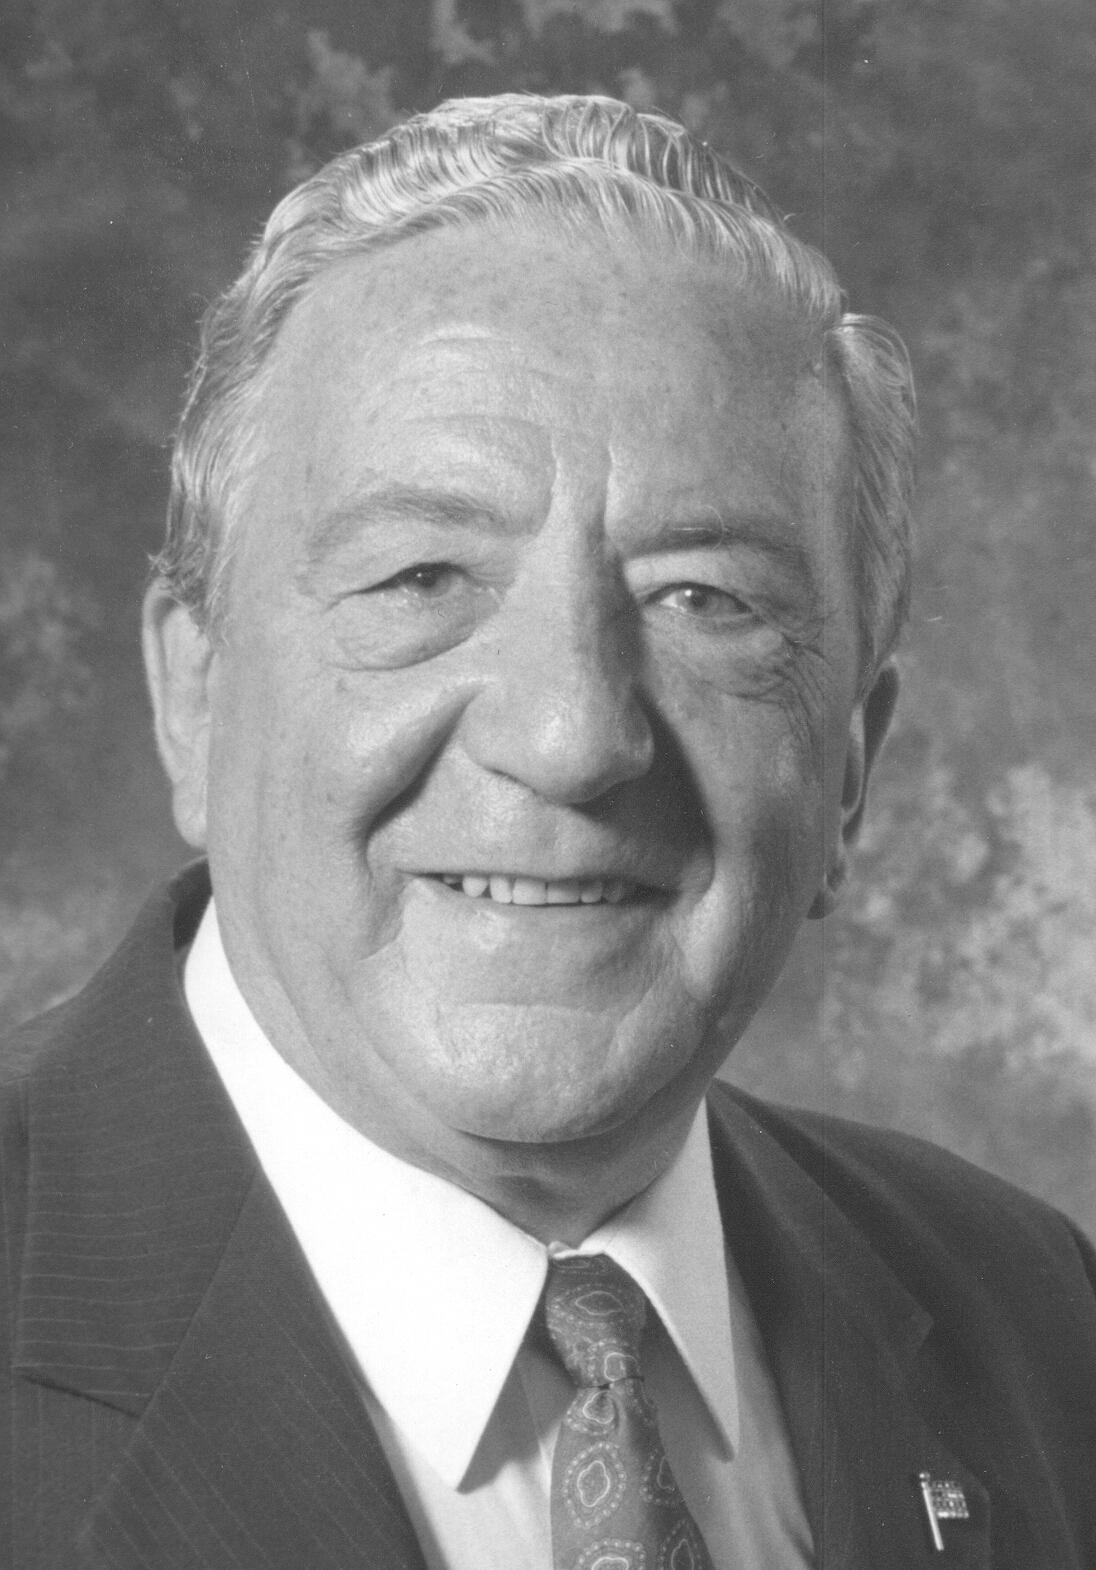 James F. Lodato